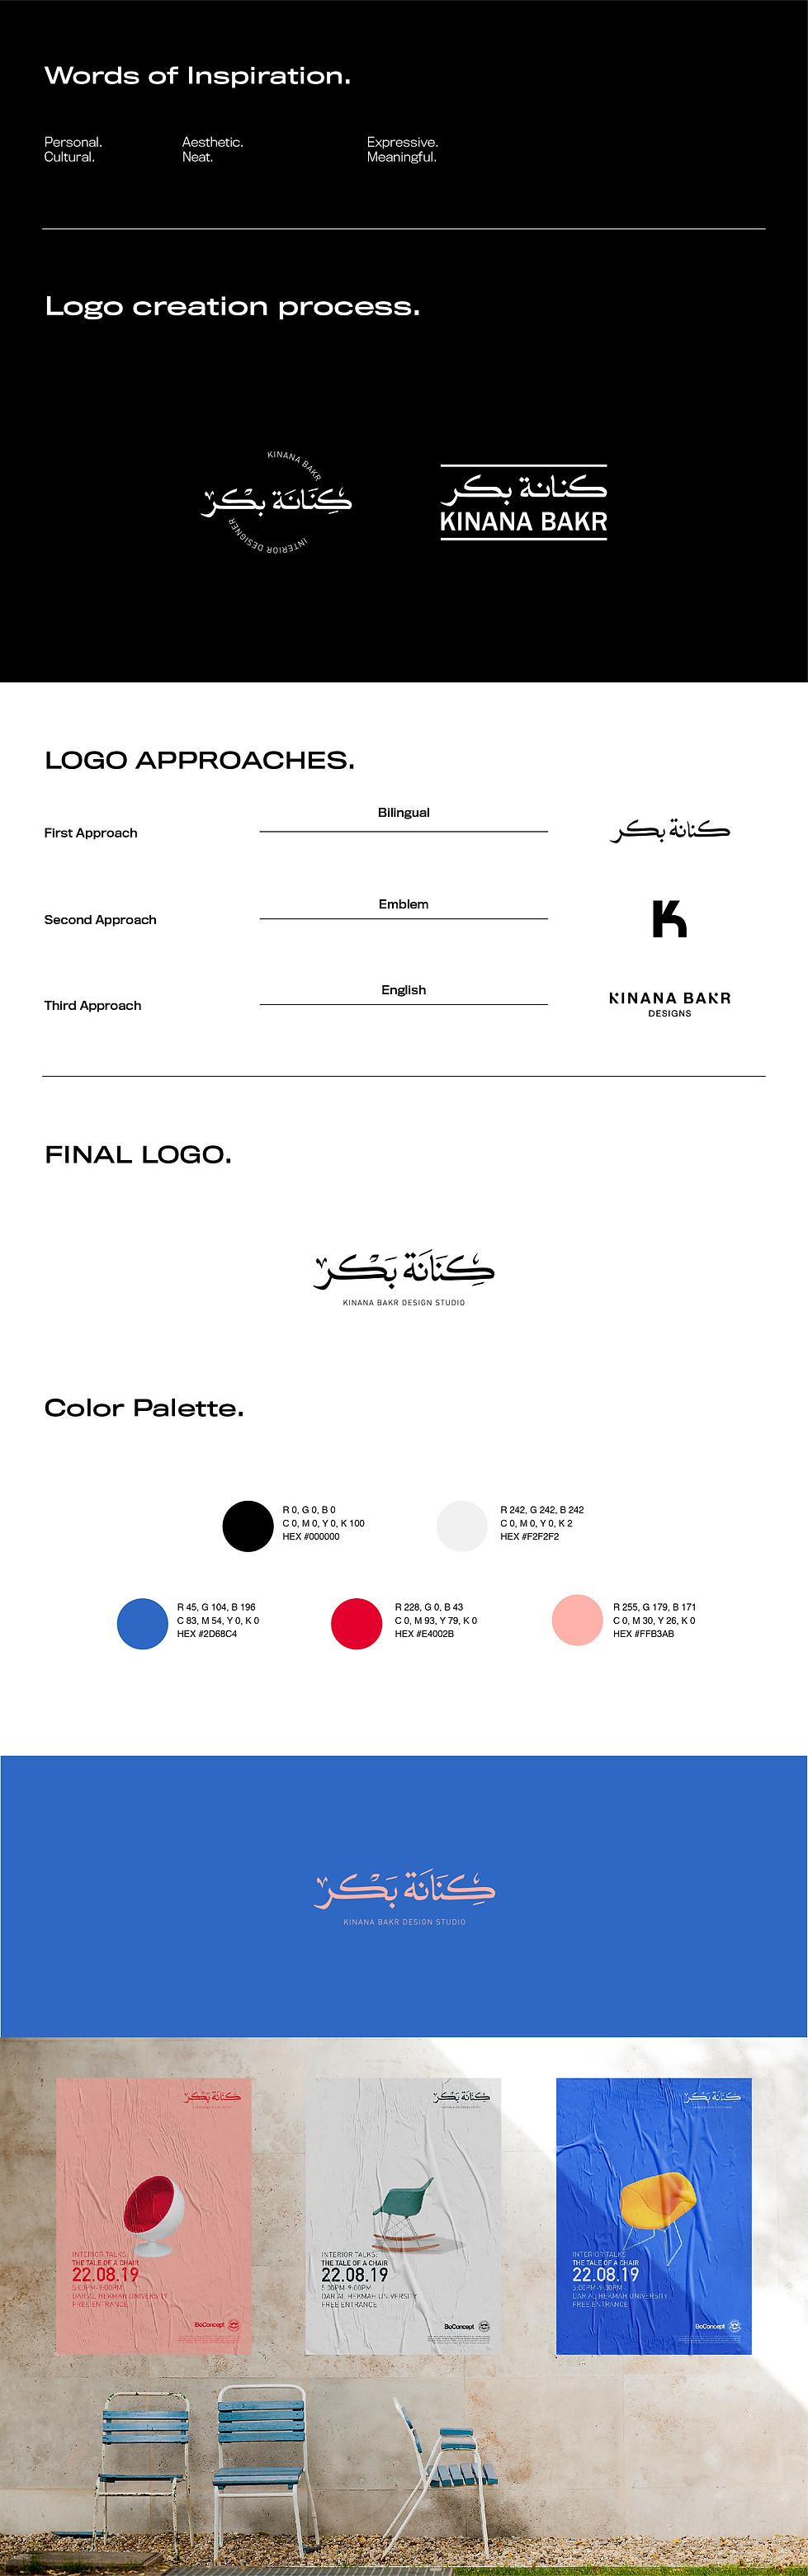 Kinana Bakr   Process-01.jpg